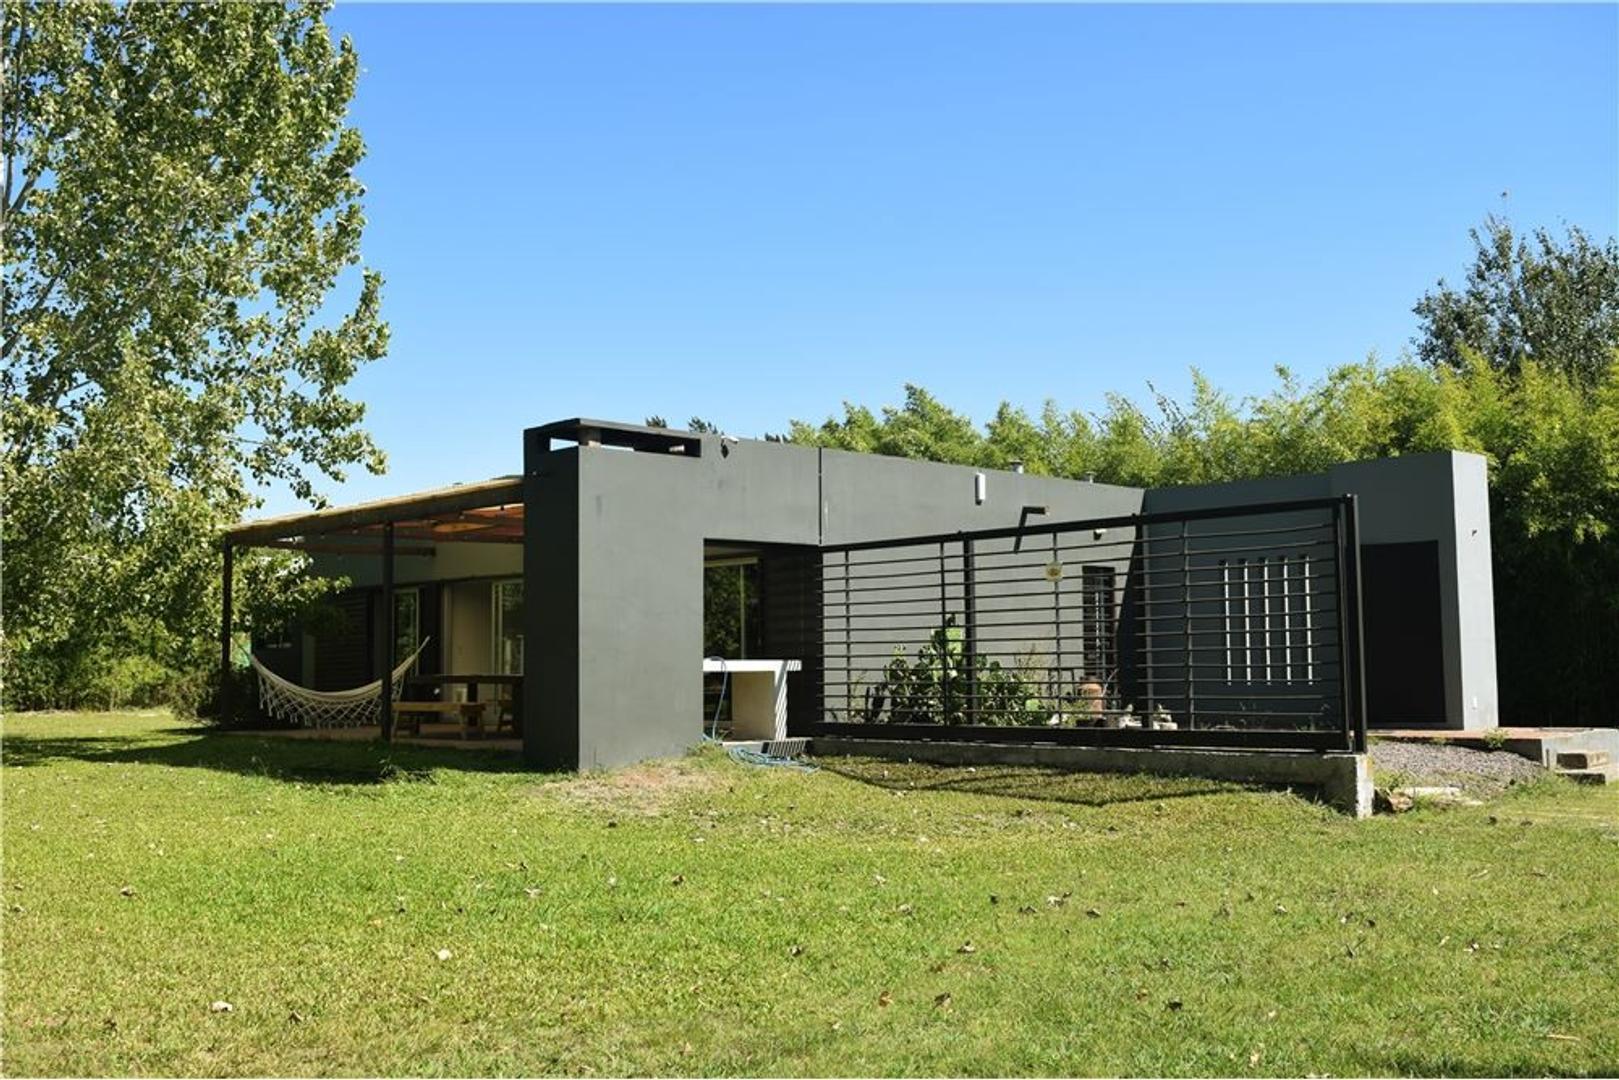 Alquiler de Casa Moderna, Pilar